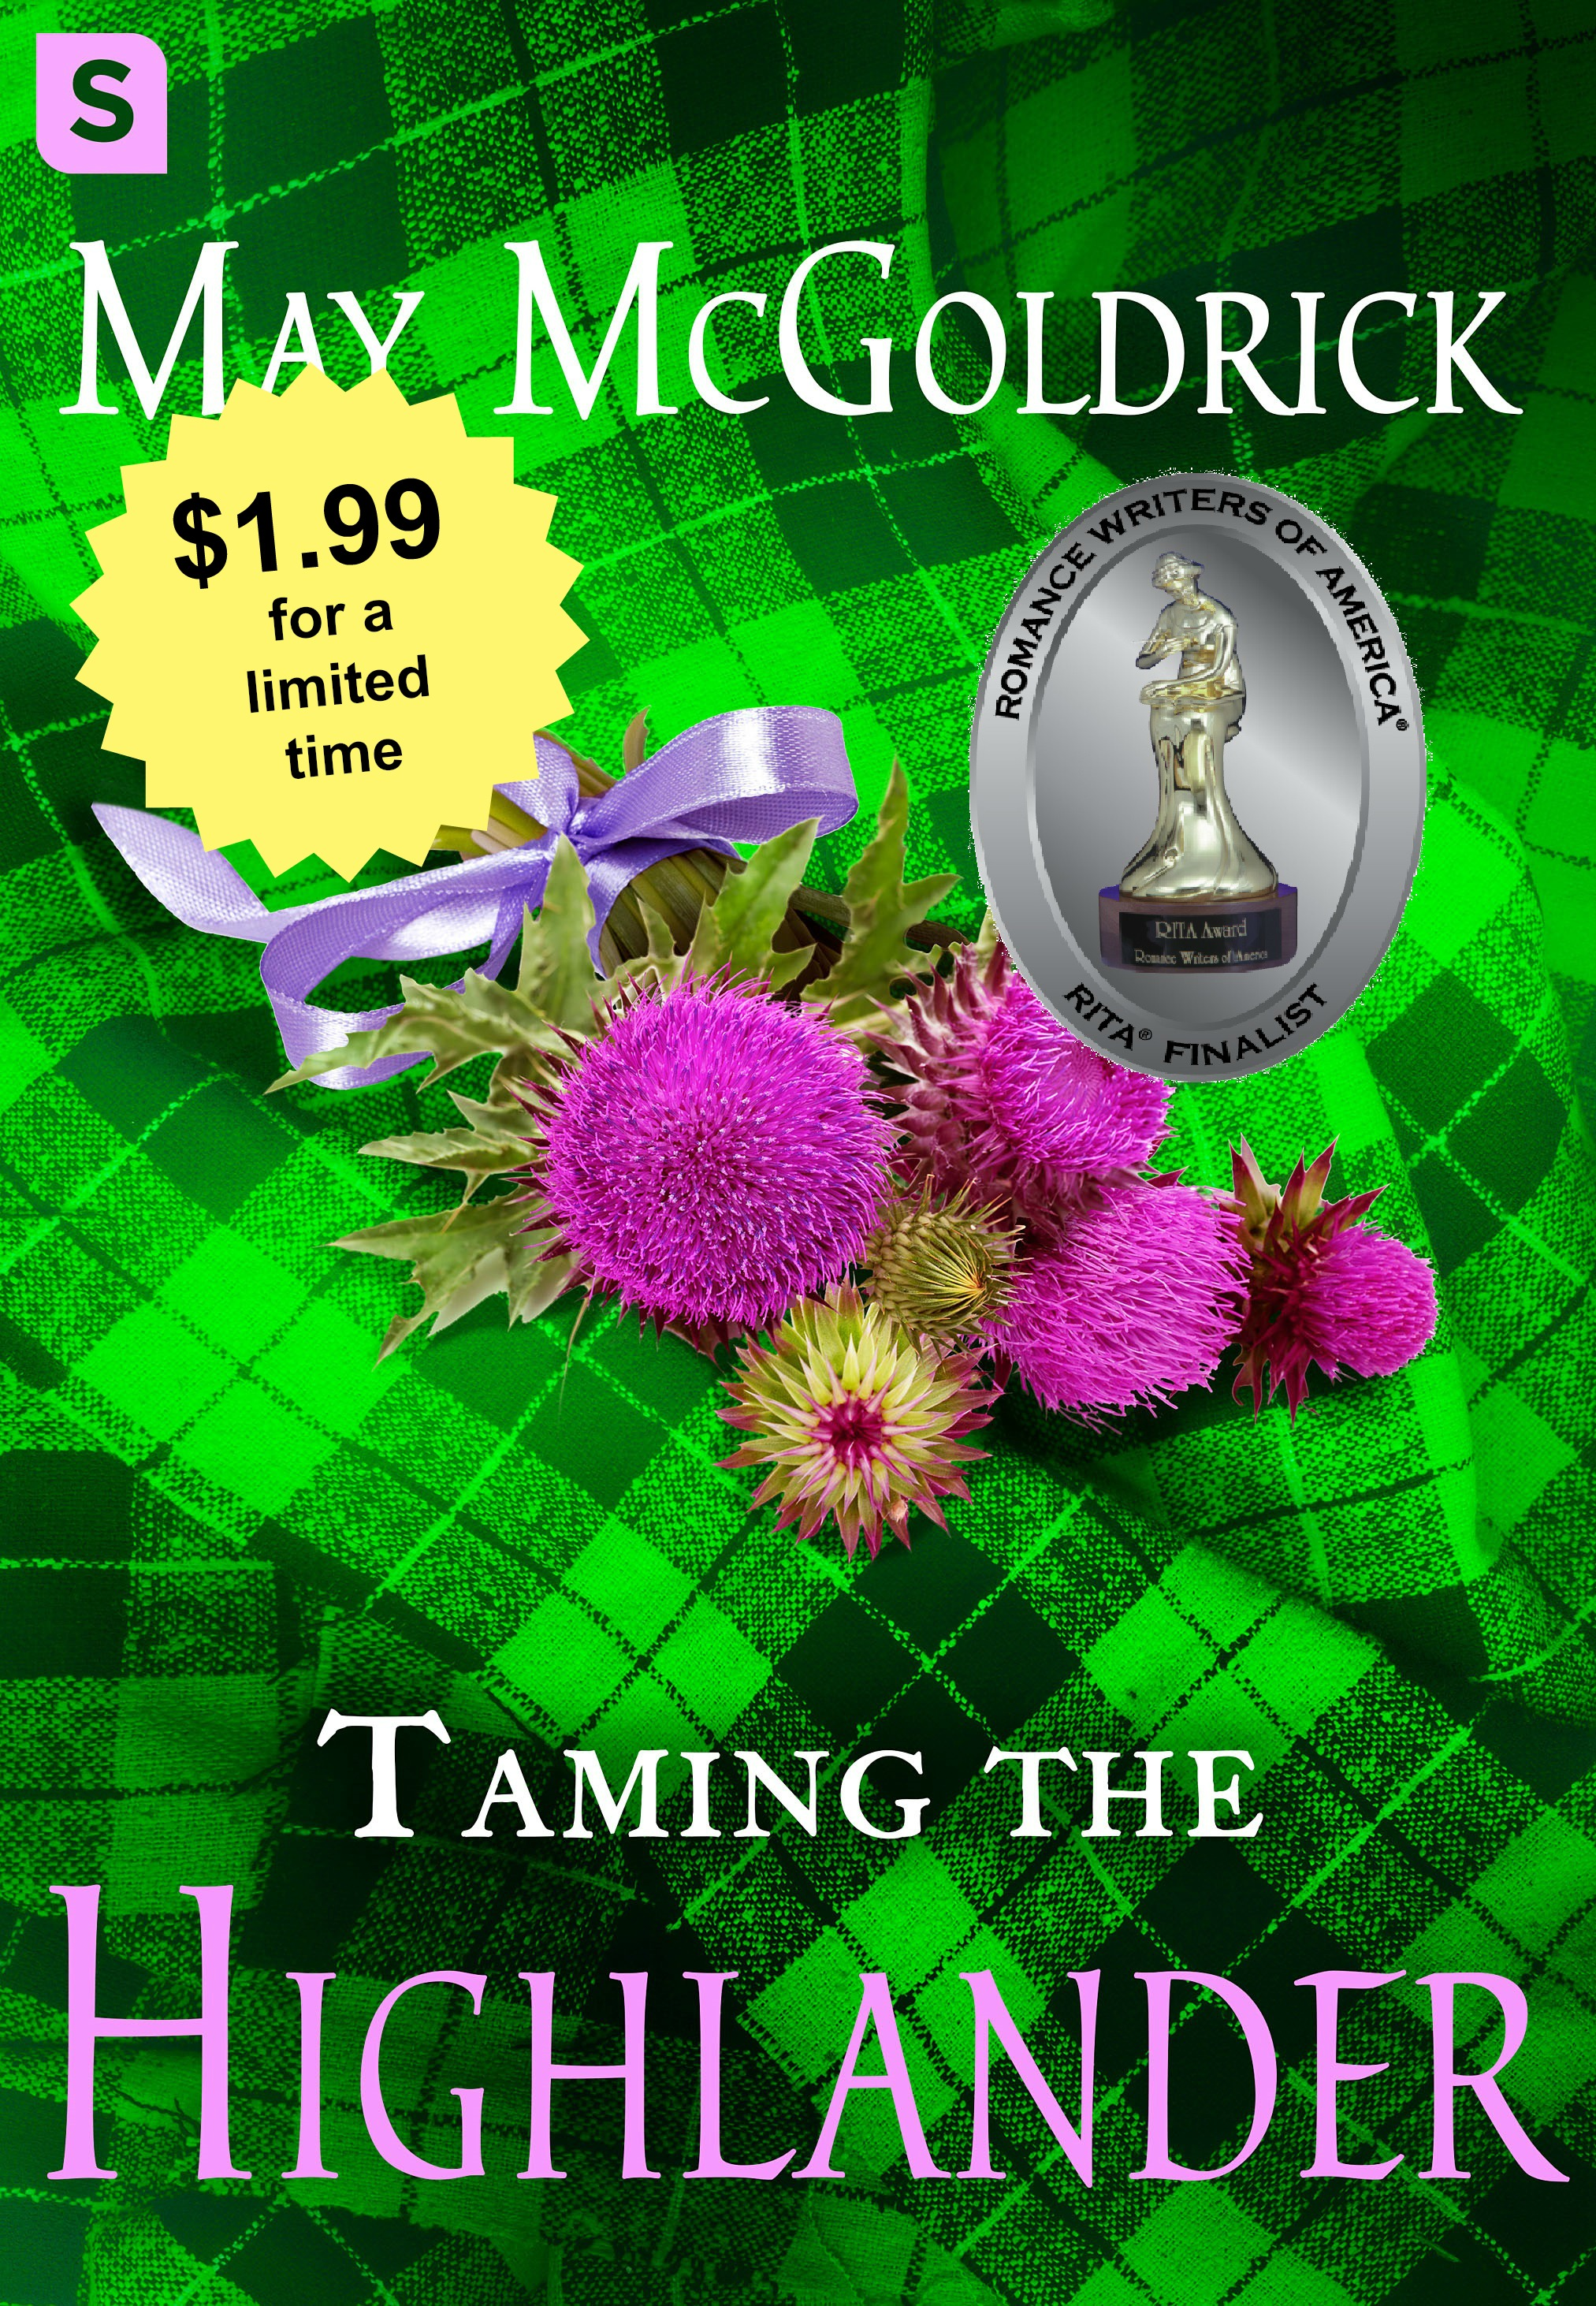 taming the highlander sale price.jpg